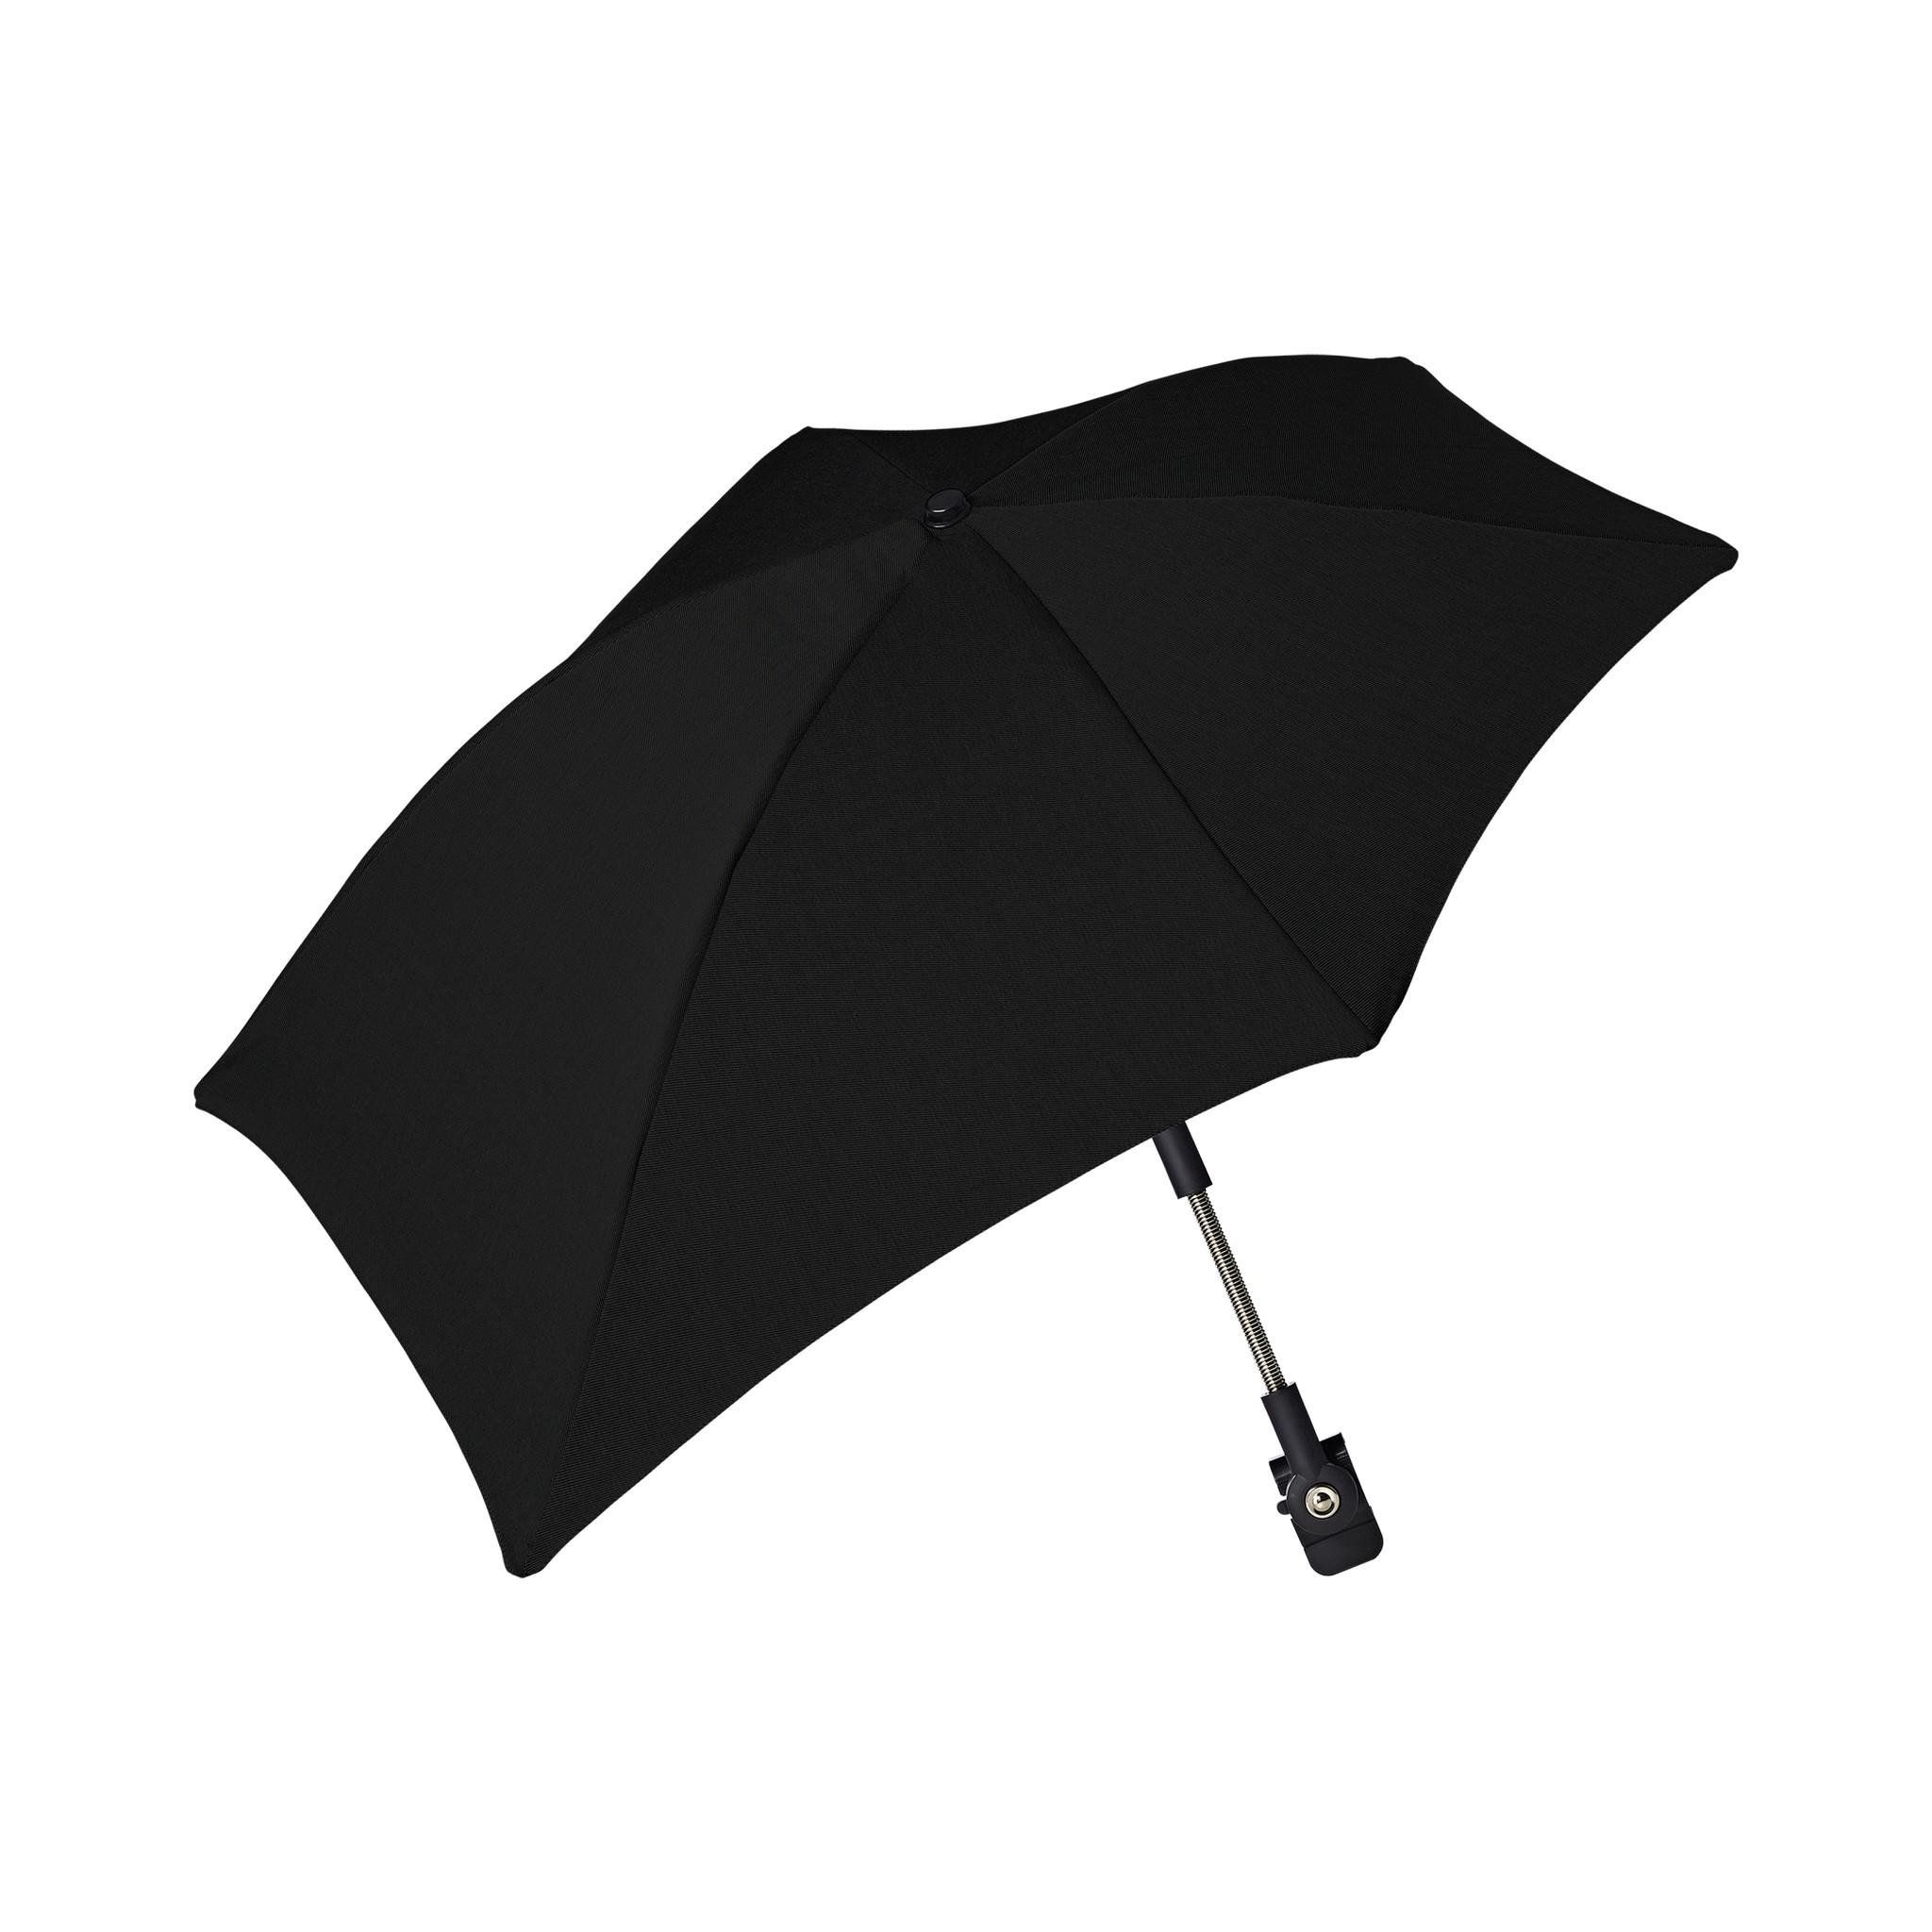 Joolz - Day/Geo parasol - Brilliant black